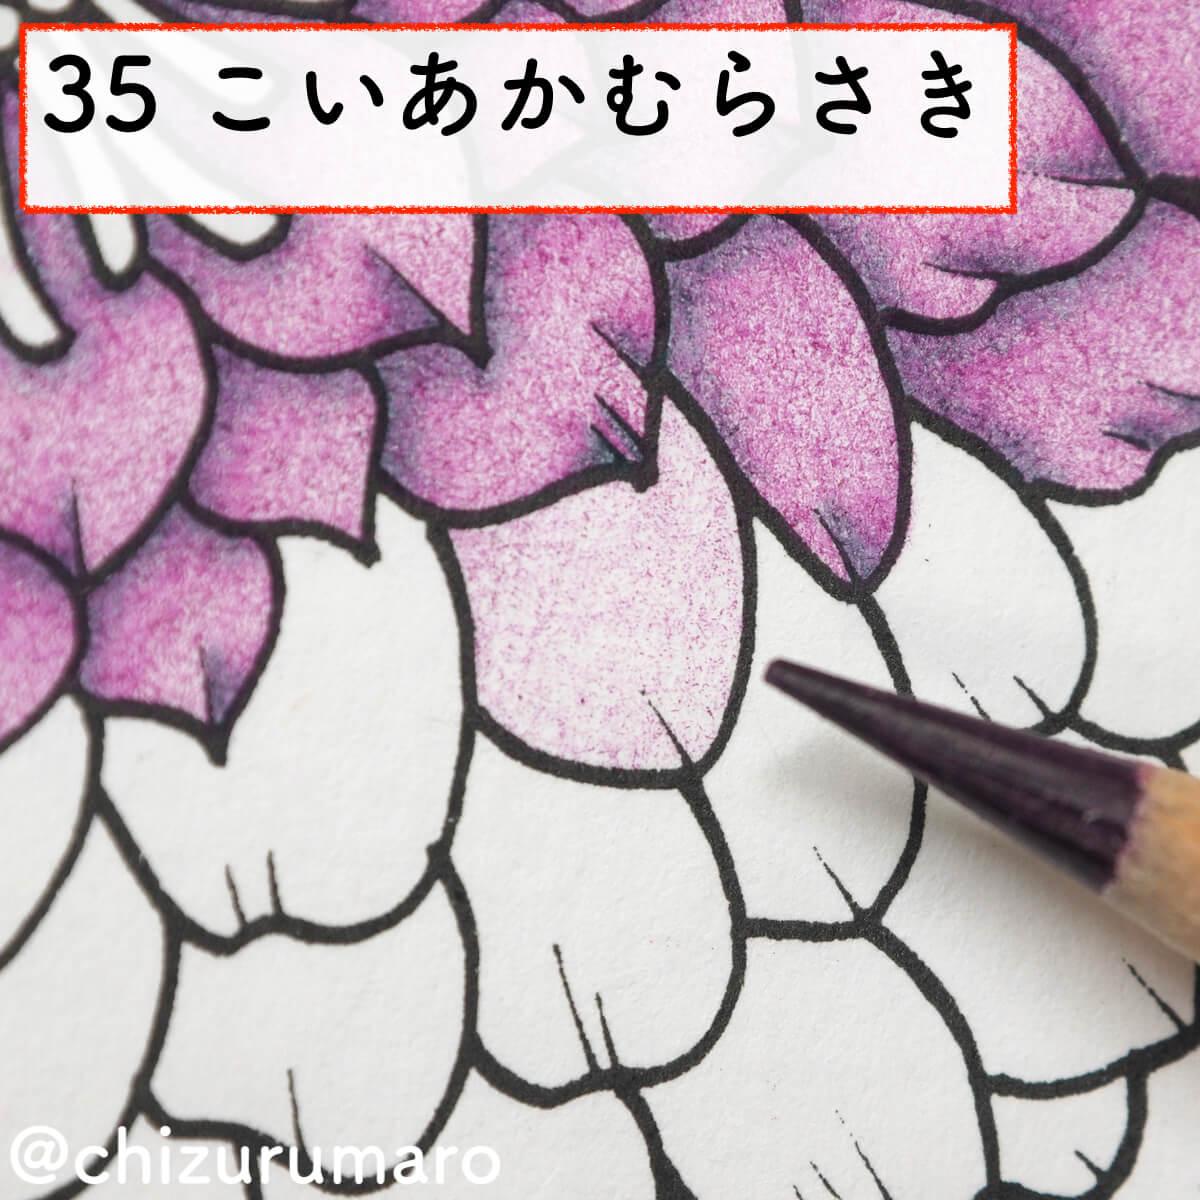 f:id:chizurumaro:20200311151623j:plain